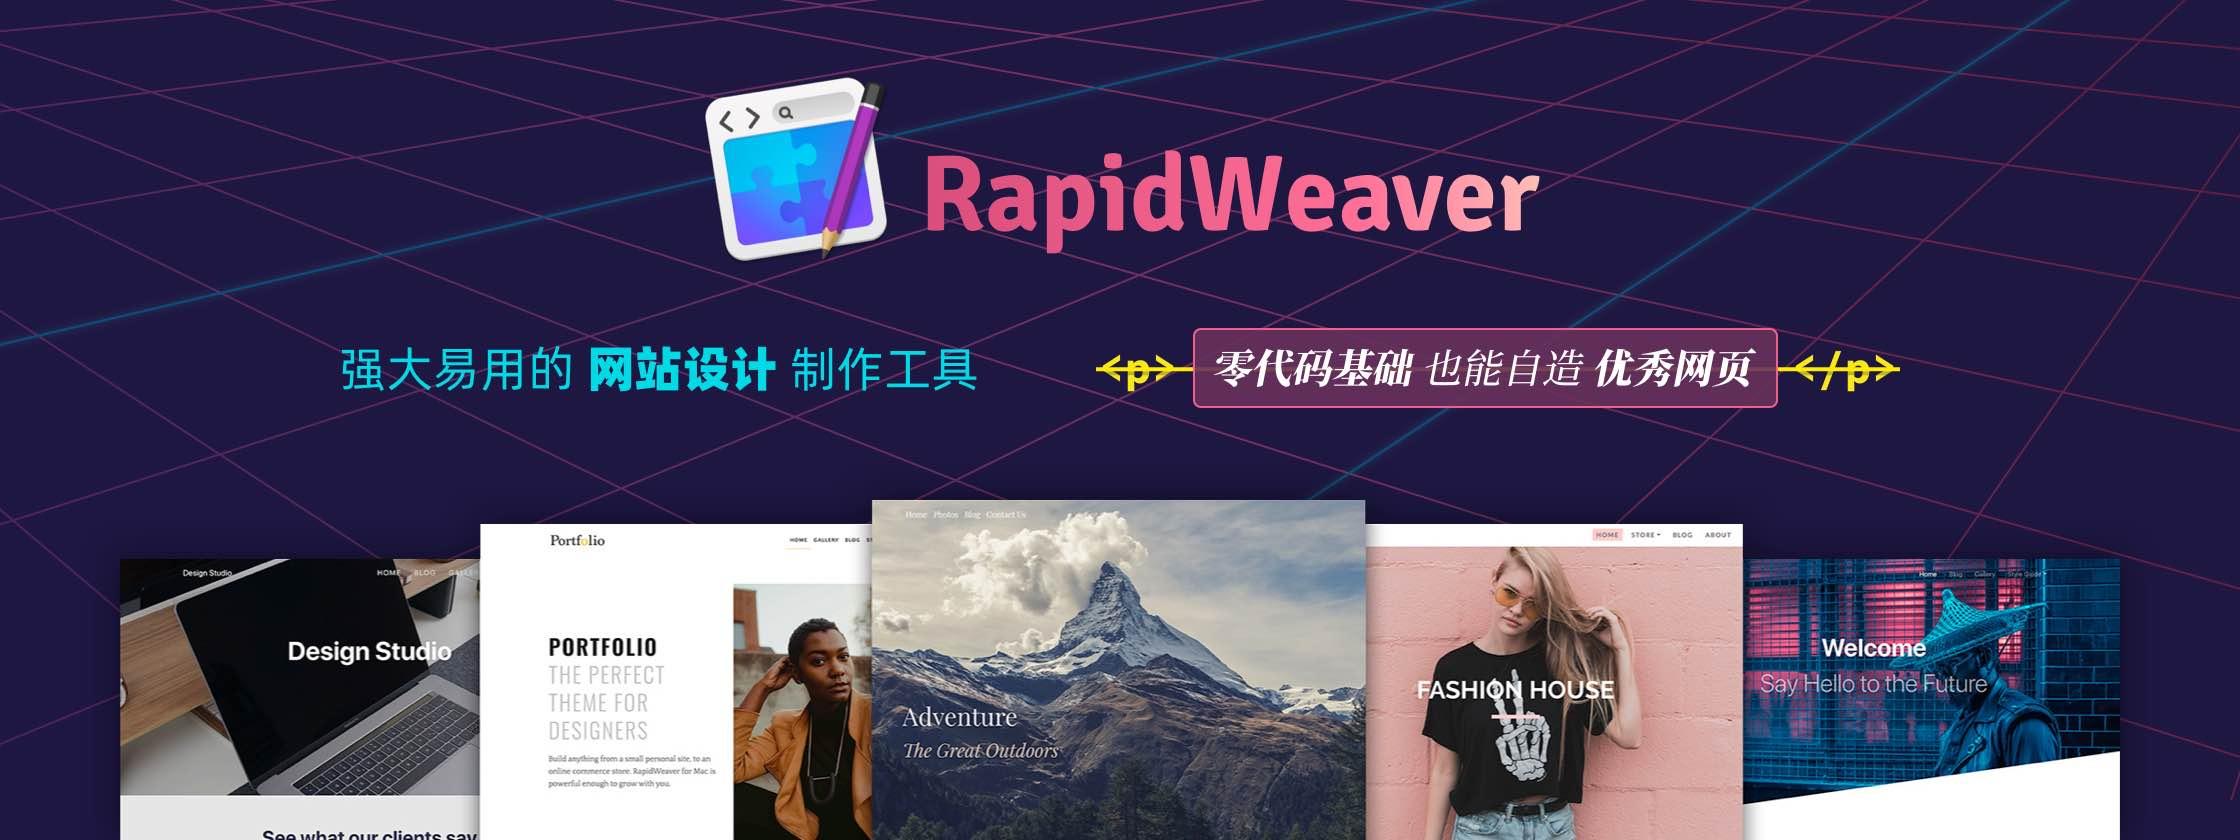 RapidWeaver – 强大却易用的网页设计制作工具